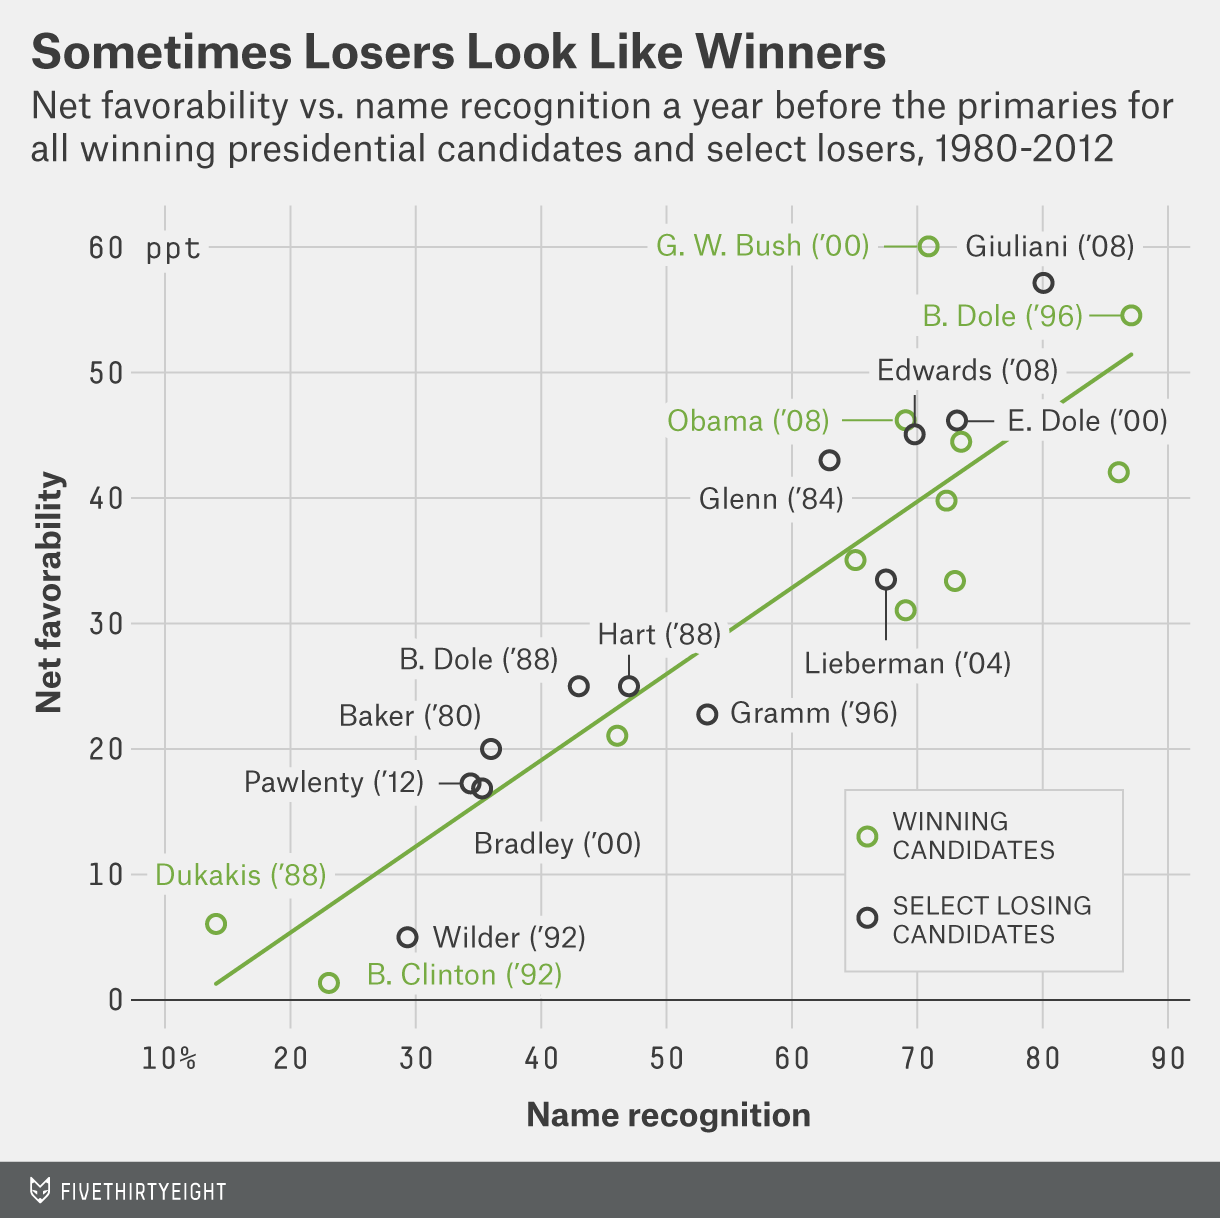 enten-datalab-loserslooklikewinners-1